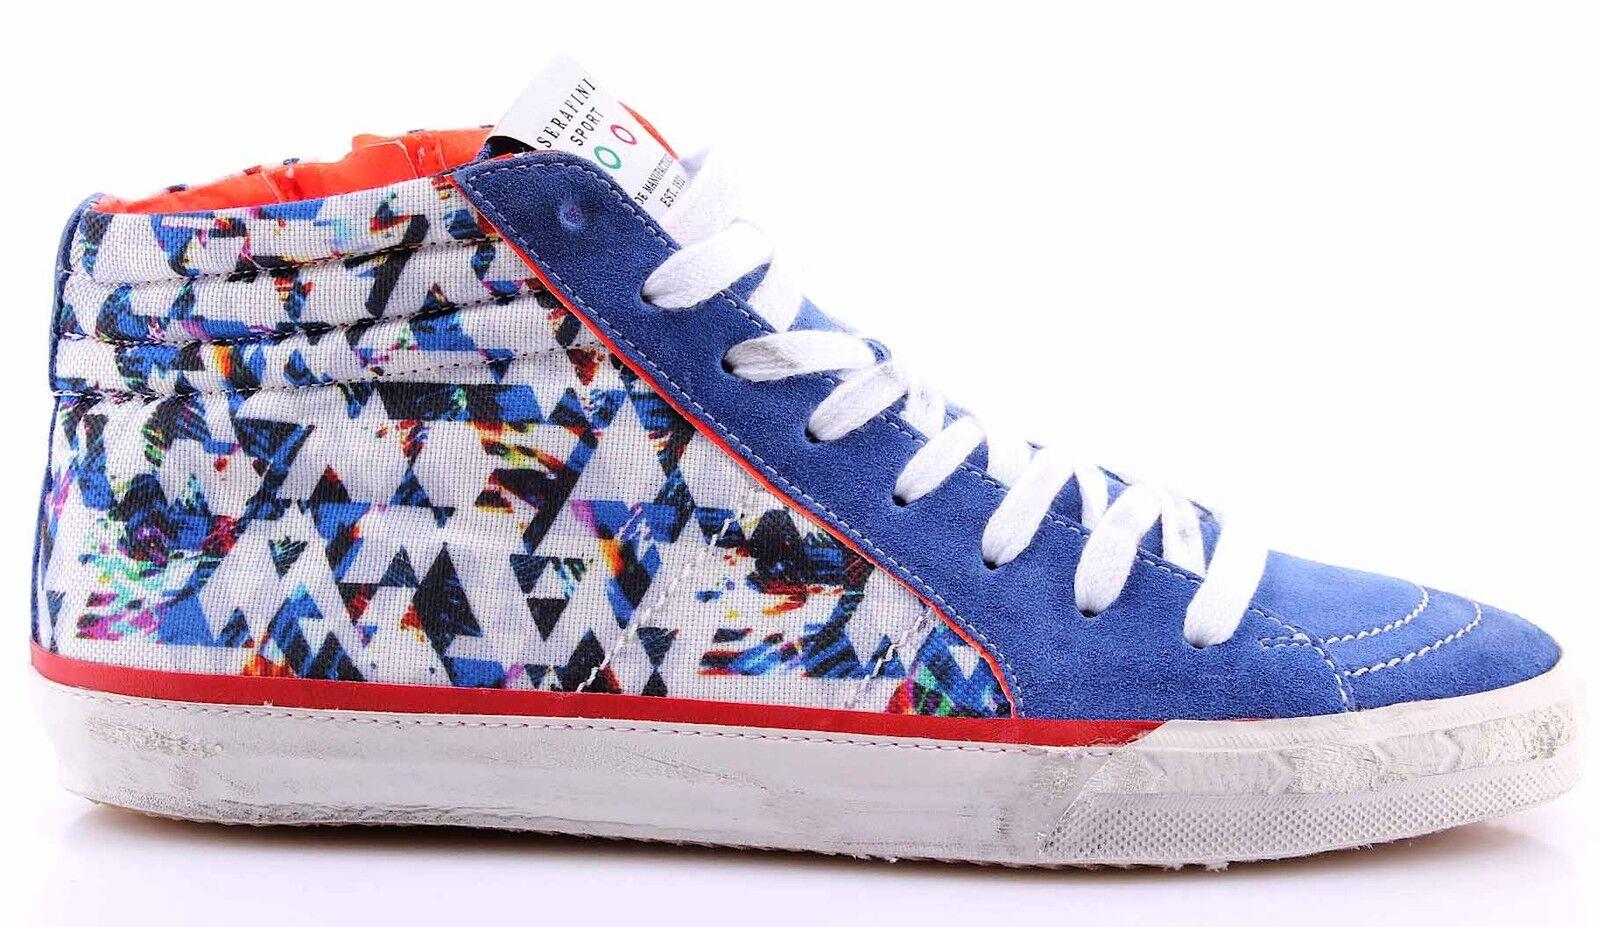 Herren Schuhe Sneakers SERAFINI Sport Caracas 3D Blau Blau Mehrfarbig Multicolor